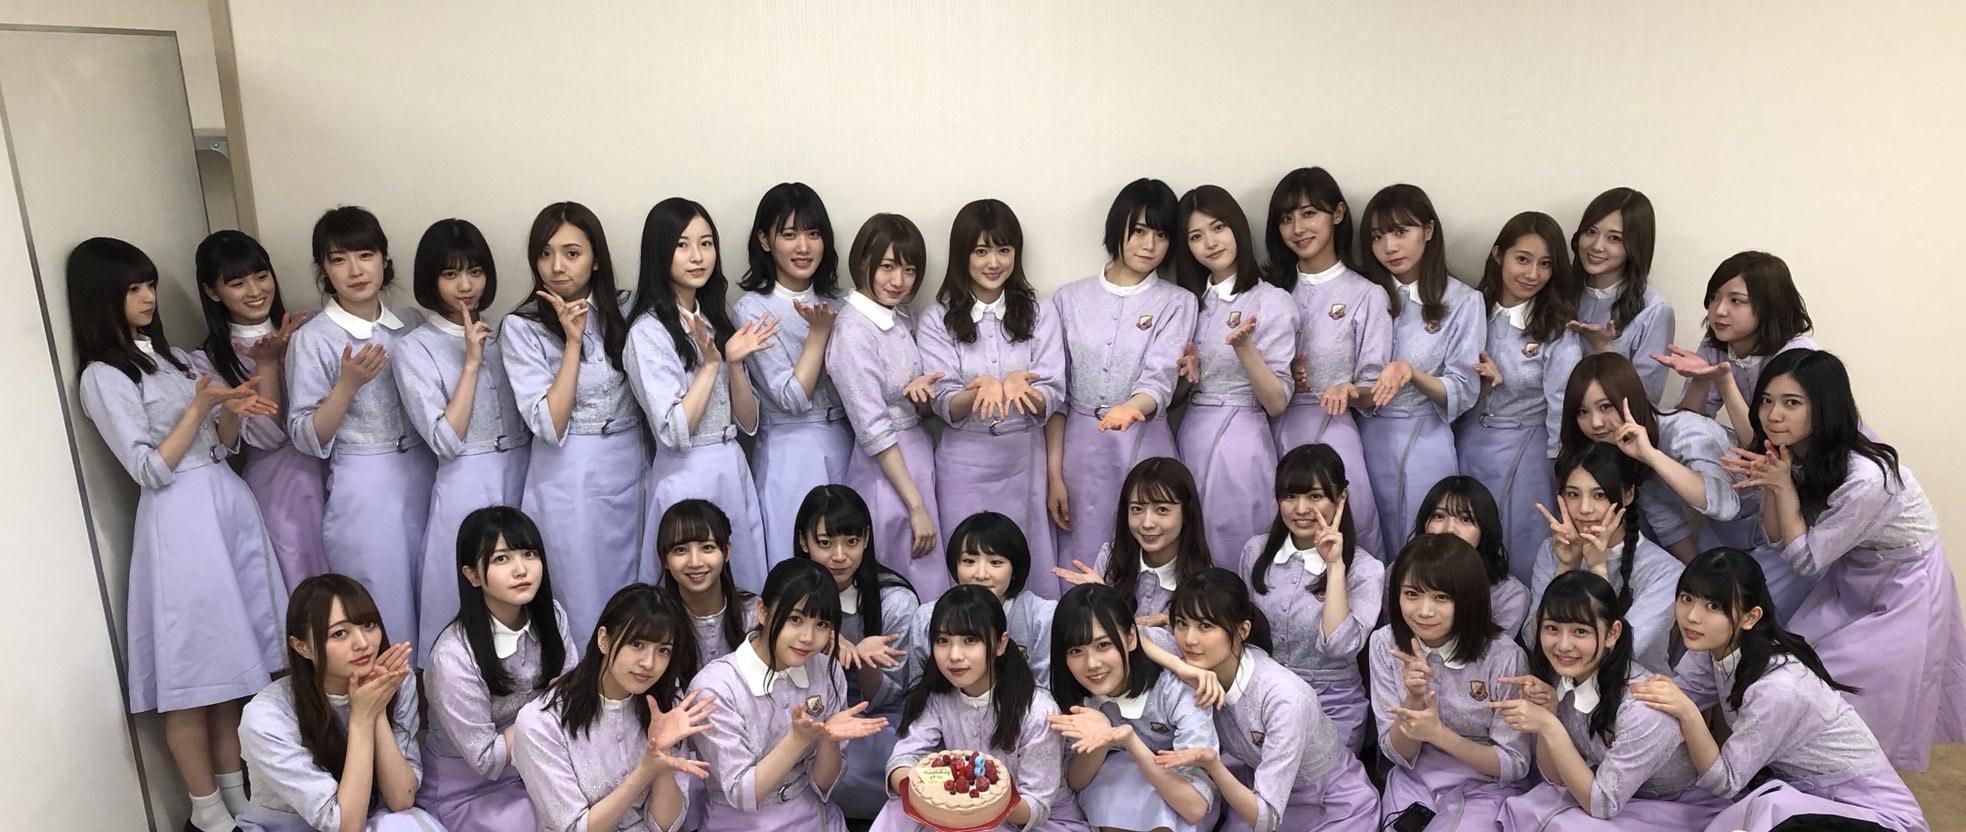 与田祐希の誕生日2018集合写真